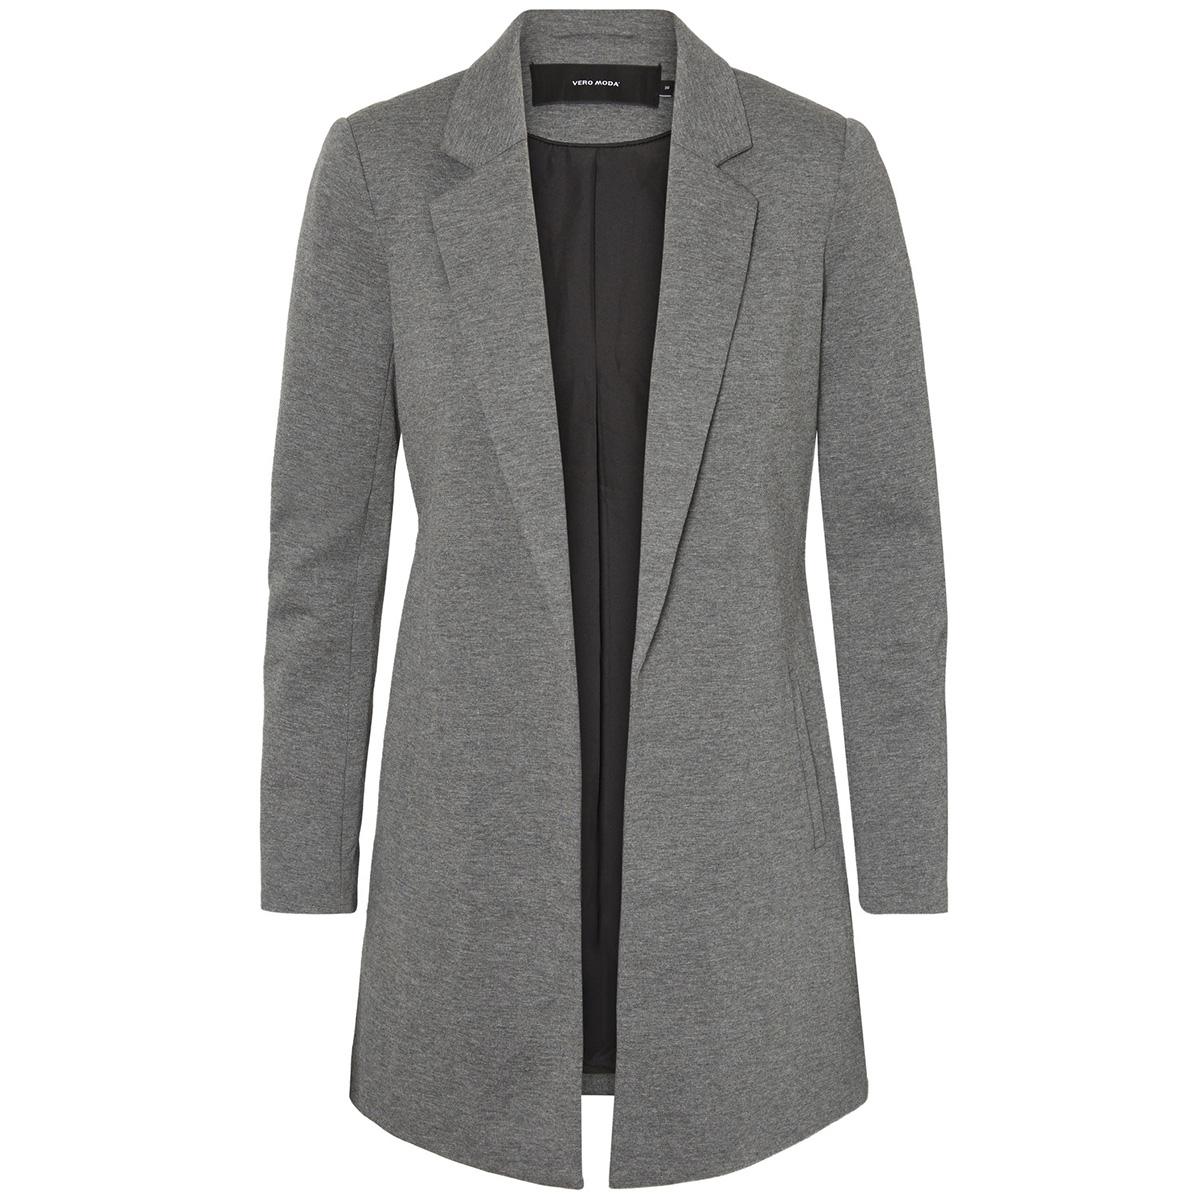 vmnova long jersey blazer exp 10199848 vero moda blazer medium grey melange